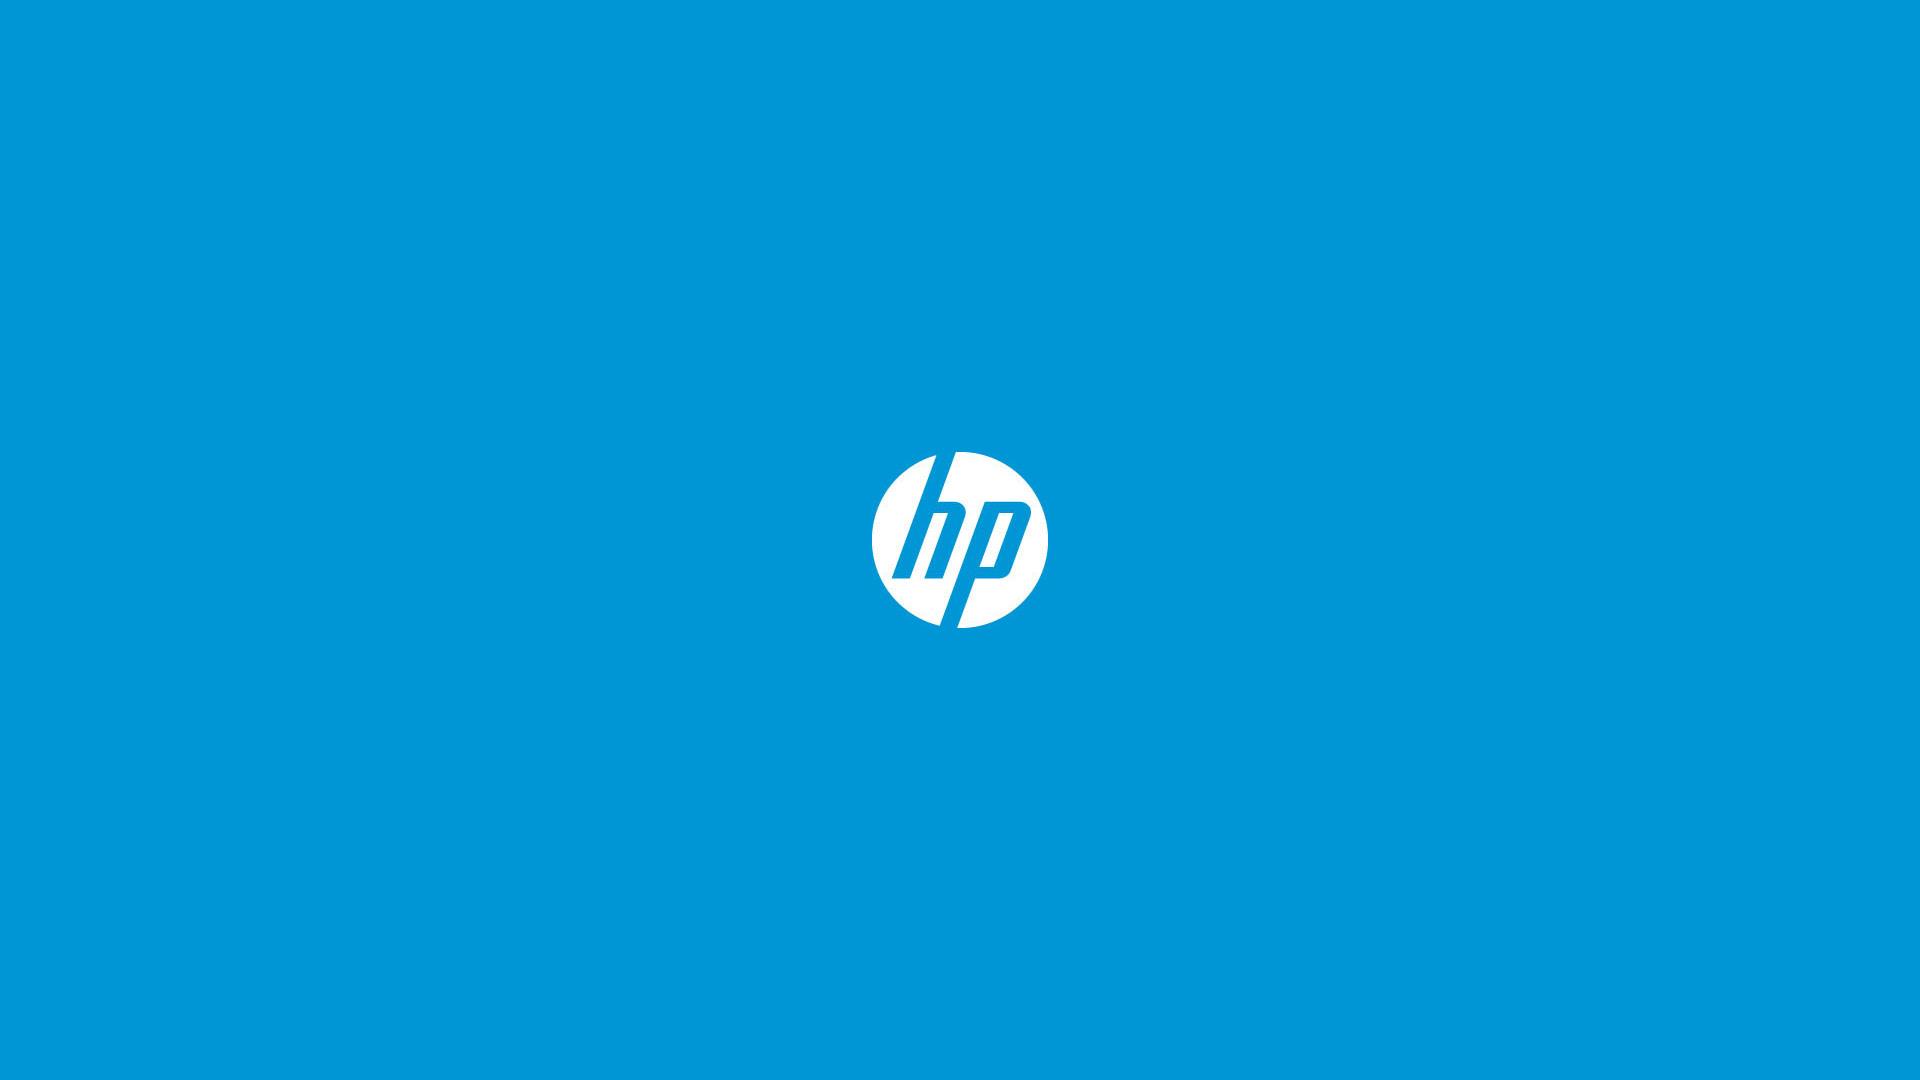 Hp logo Widescreen Wallpaper   5321 1920x1080